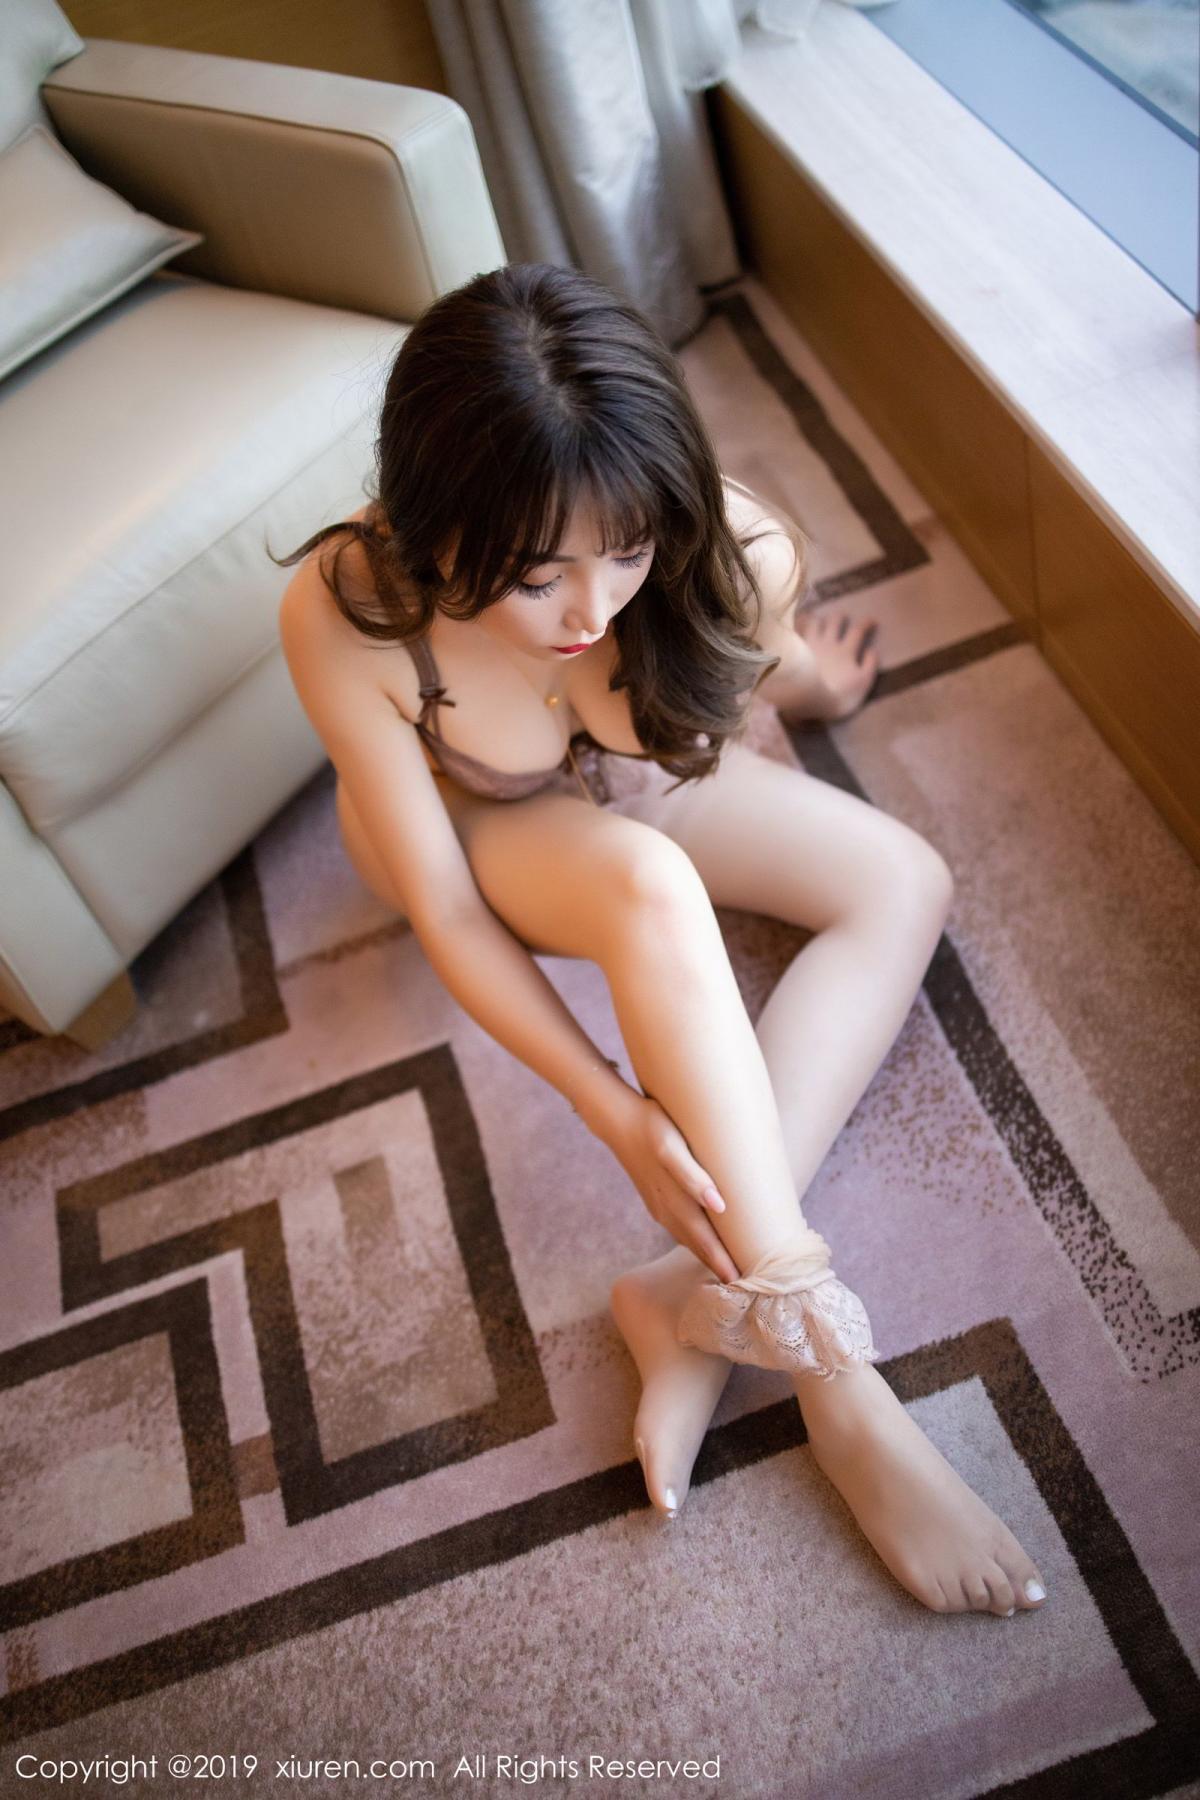 [XiuRen] Vol.1675 Chen Zhi 59P, Chen Zhi, Cheongsam, Tall, Underwear, Xiuren